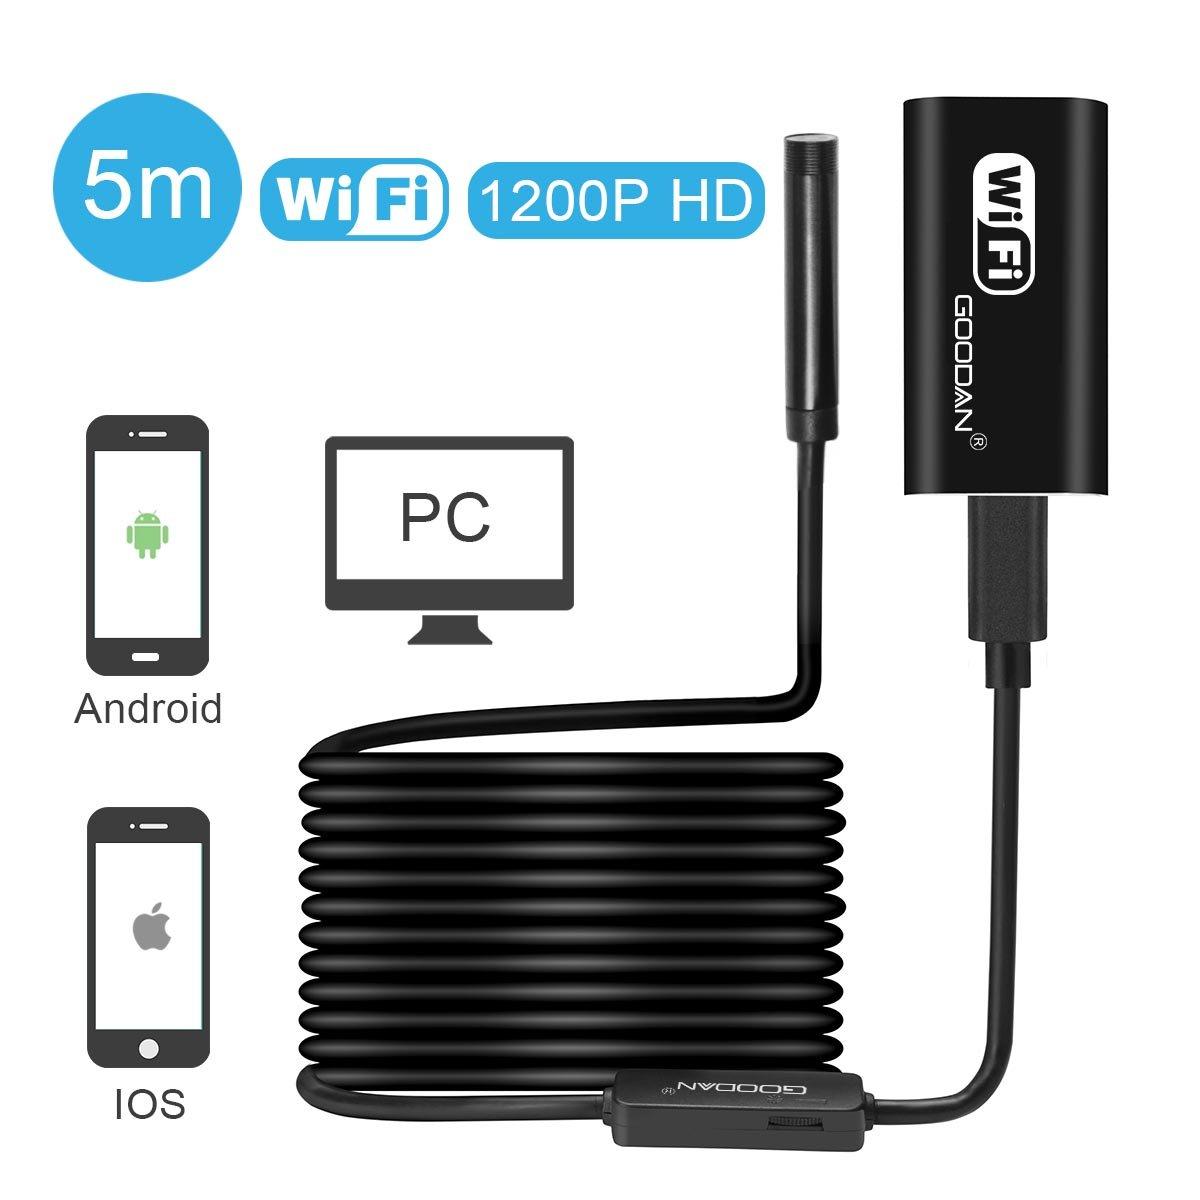 Amazon.com : Wireless Endoscope, GOODAN Updated 1200P WiFi Borescope ...